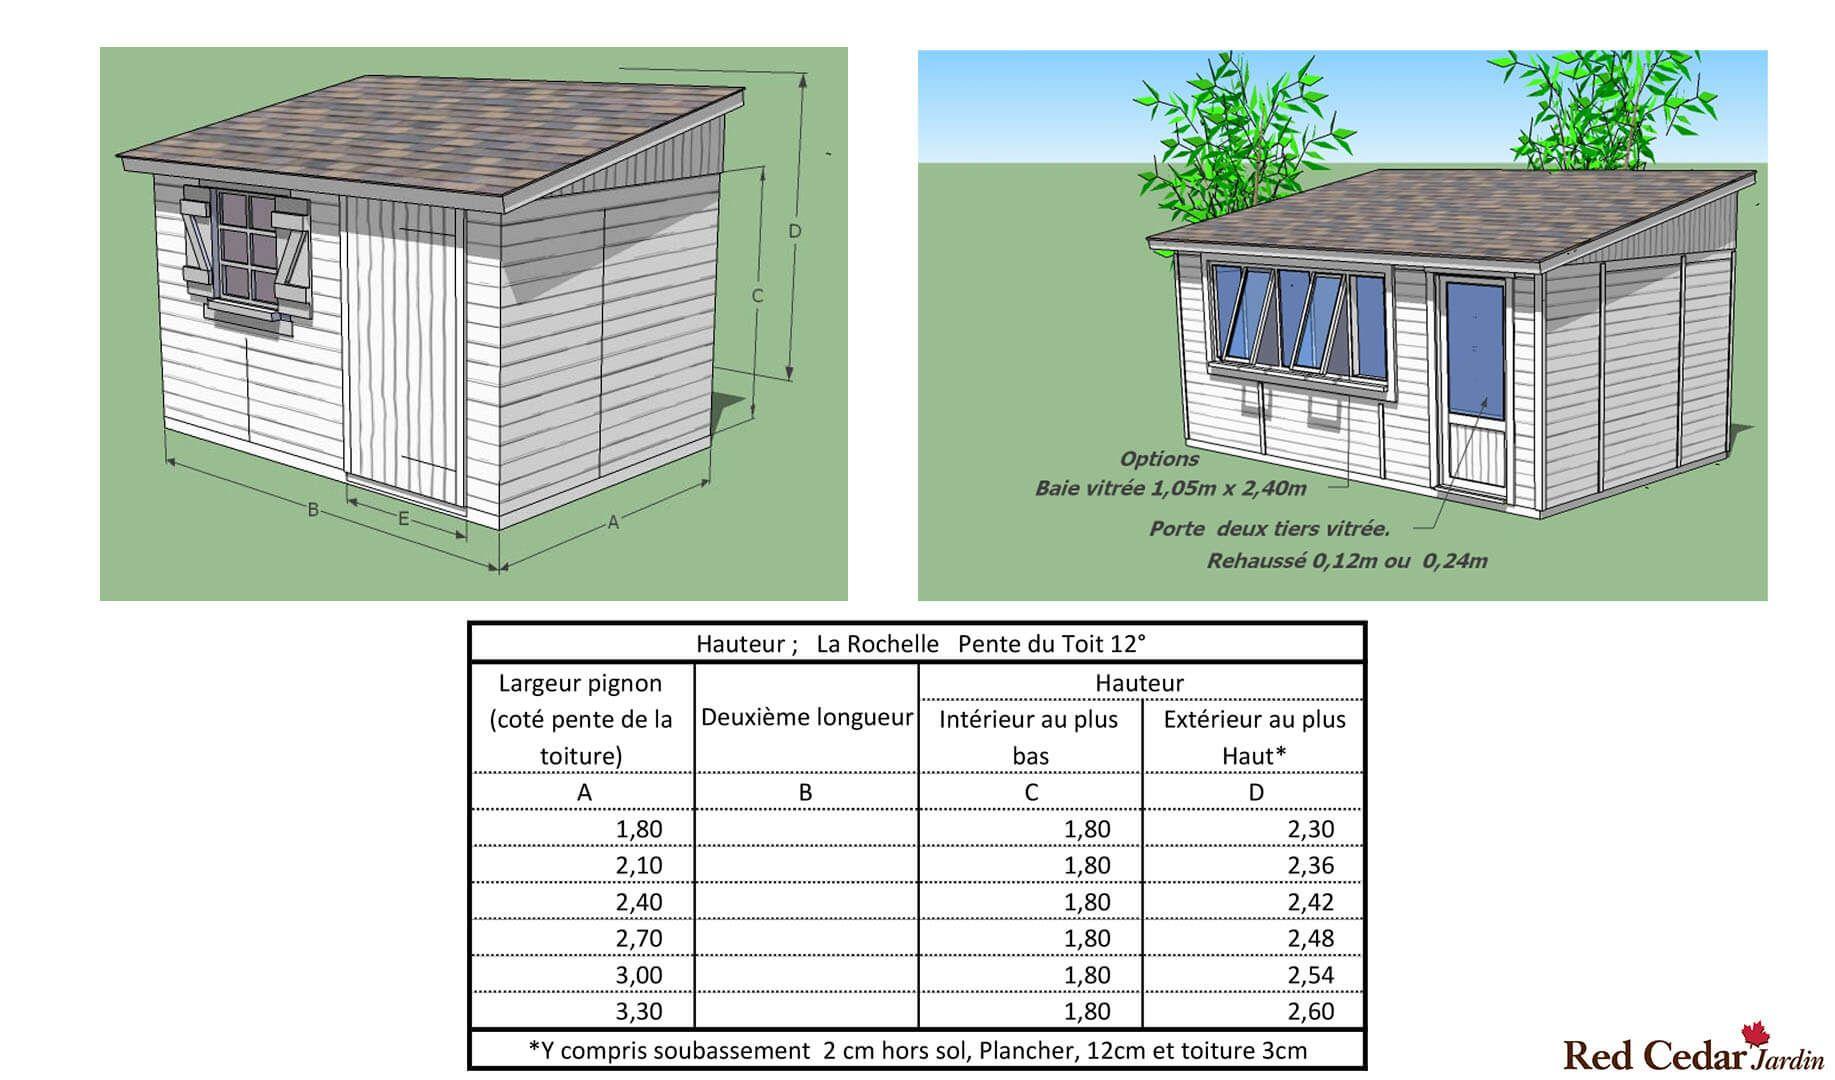 Construire Plancher Abri De Jardin modèle la rochelle, abri de jardin une pente - red cedar